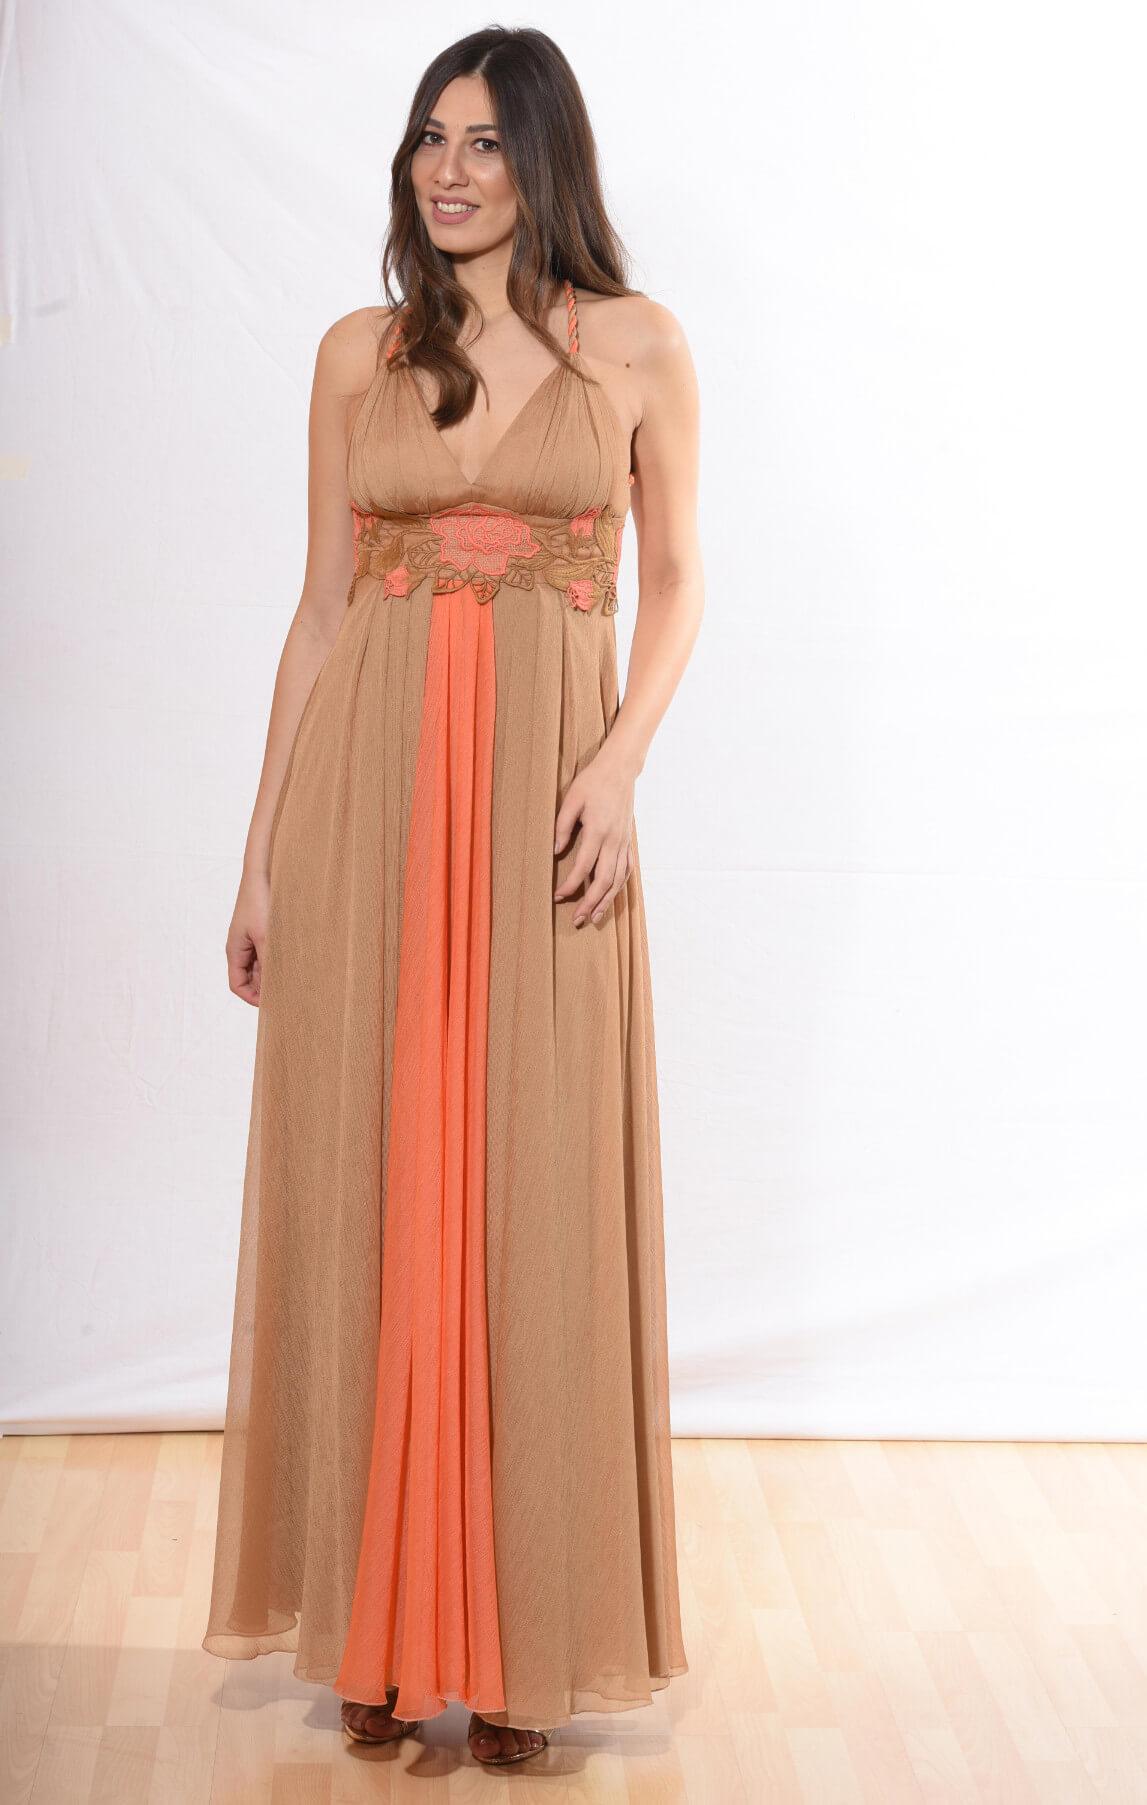 a25a8a88308 Βραδινό μάξι αέρινο φόρεμα σε σοκολατί και σομόν αποχρώσεις με μοτίφ  λουλούδι